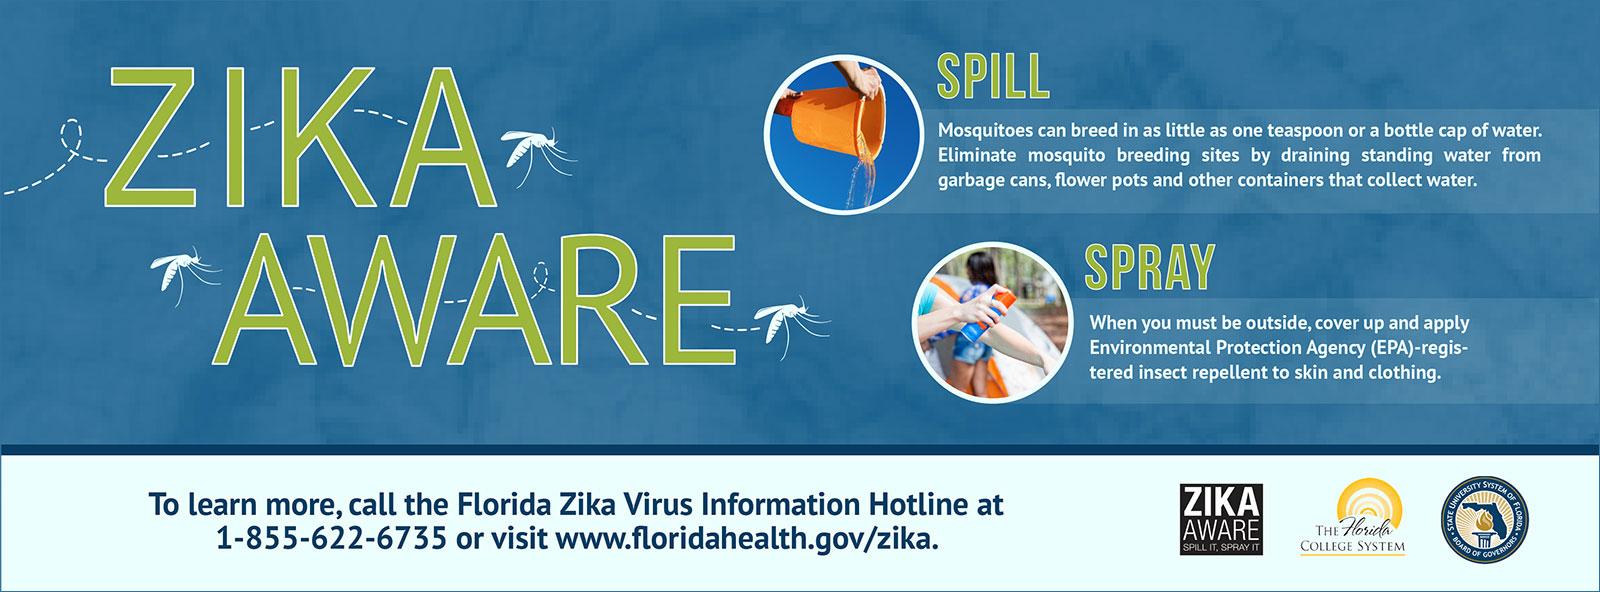 Zika aware